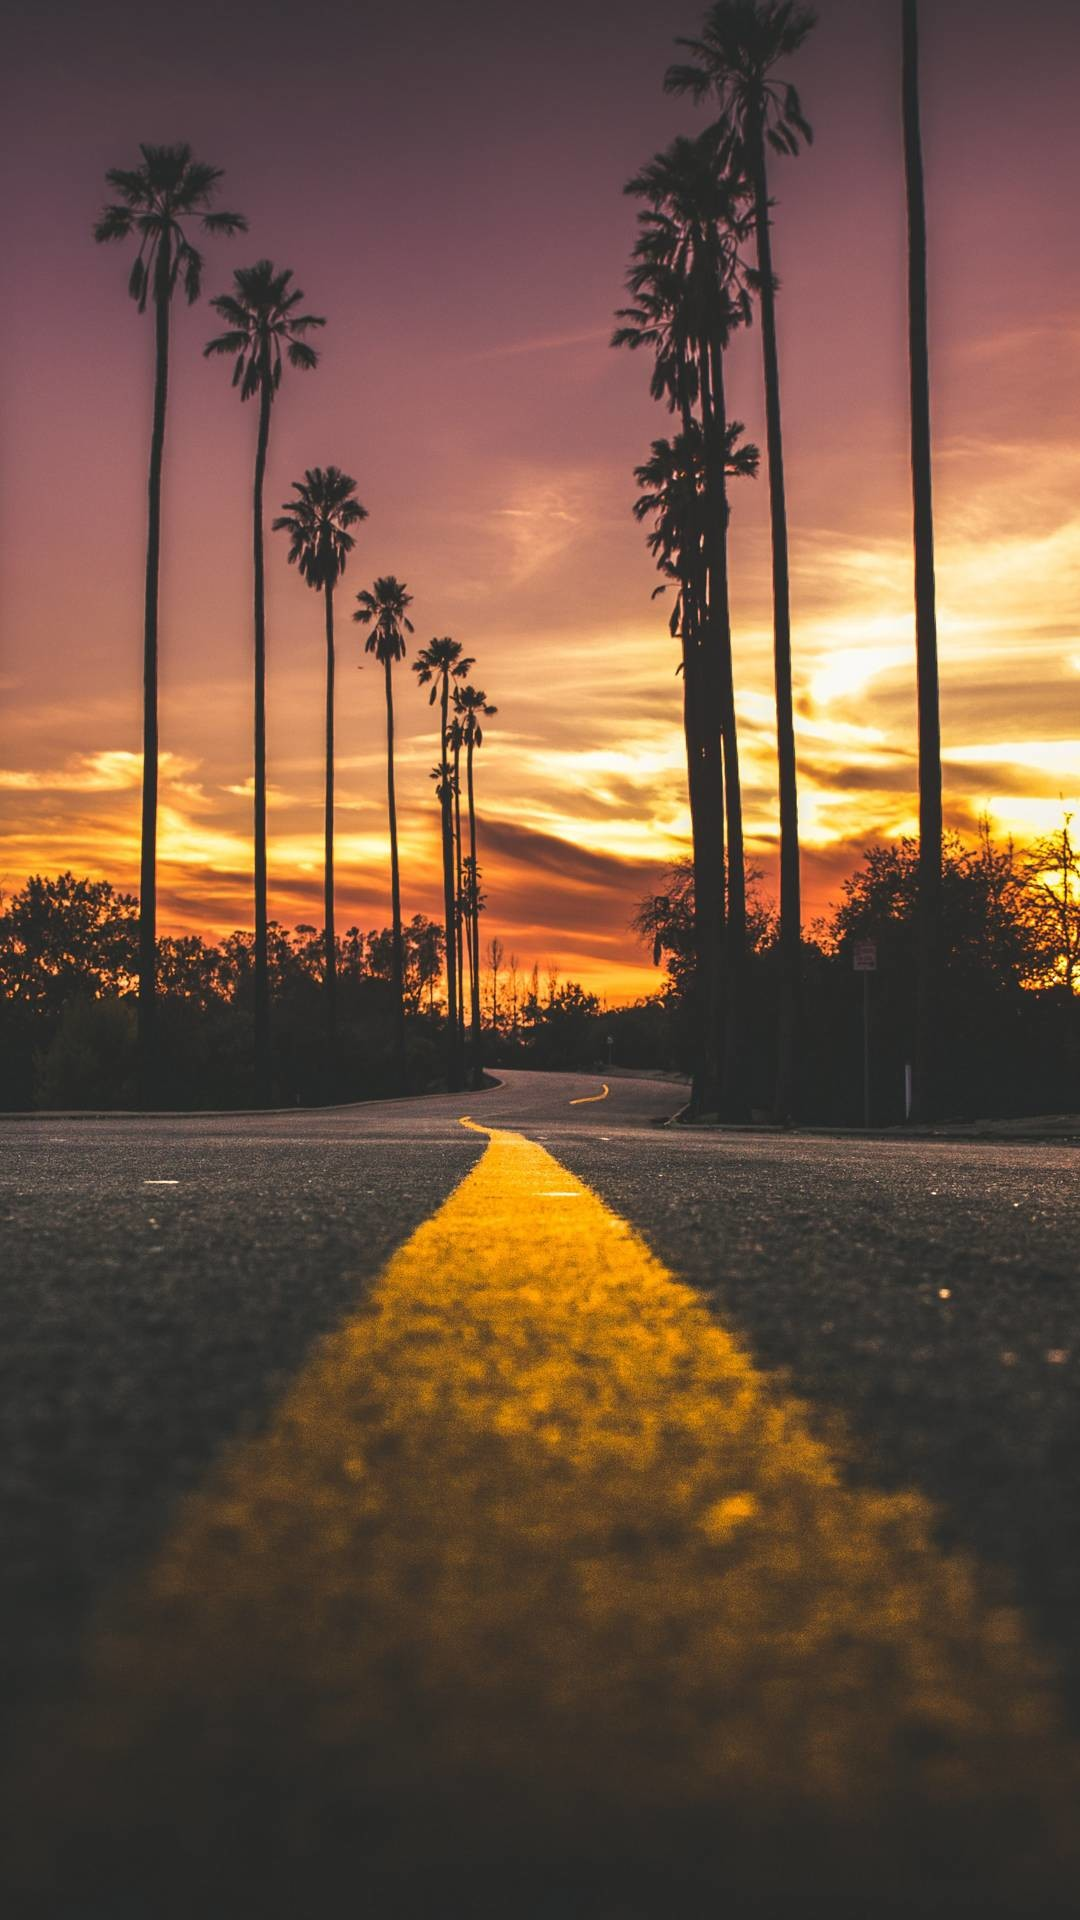 California Sunset Wallpaper 54 Images